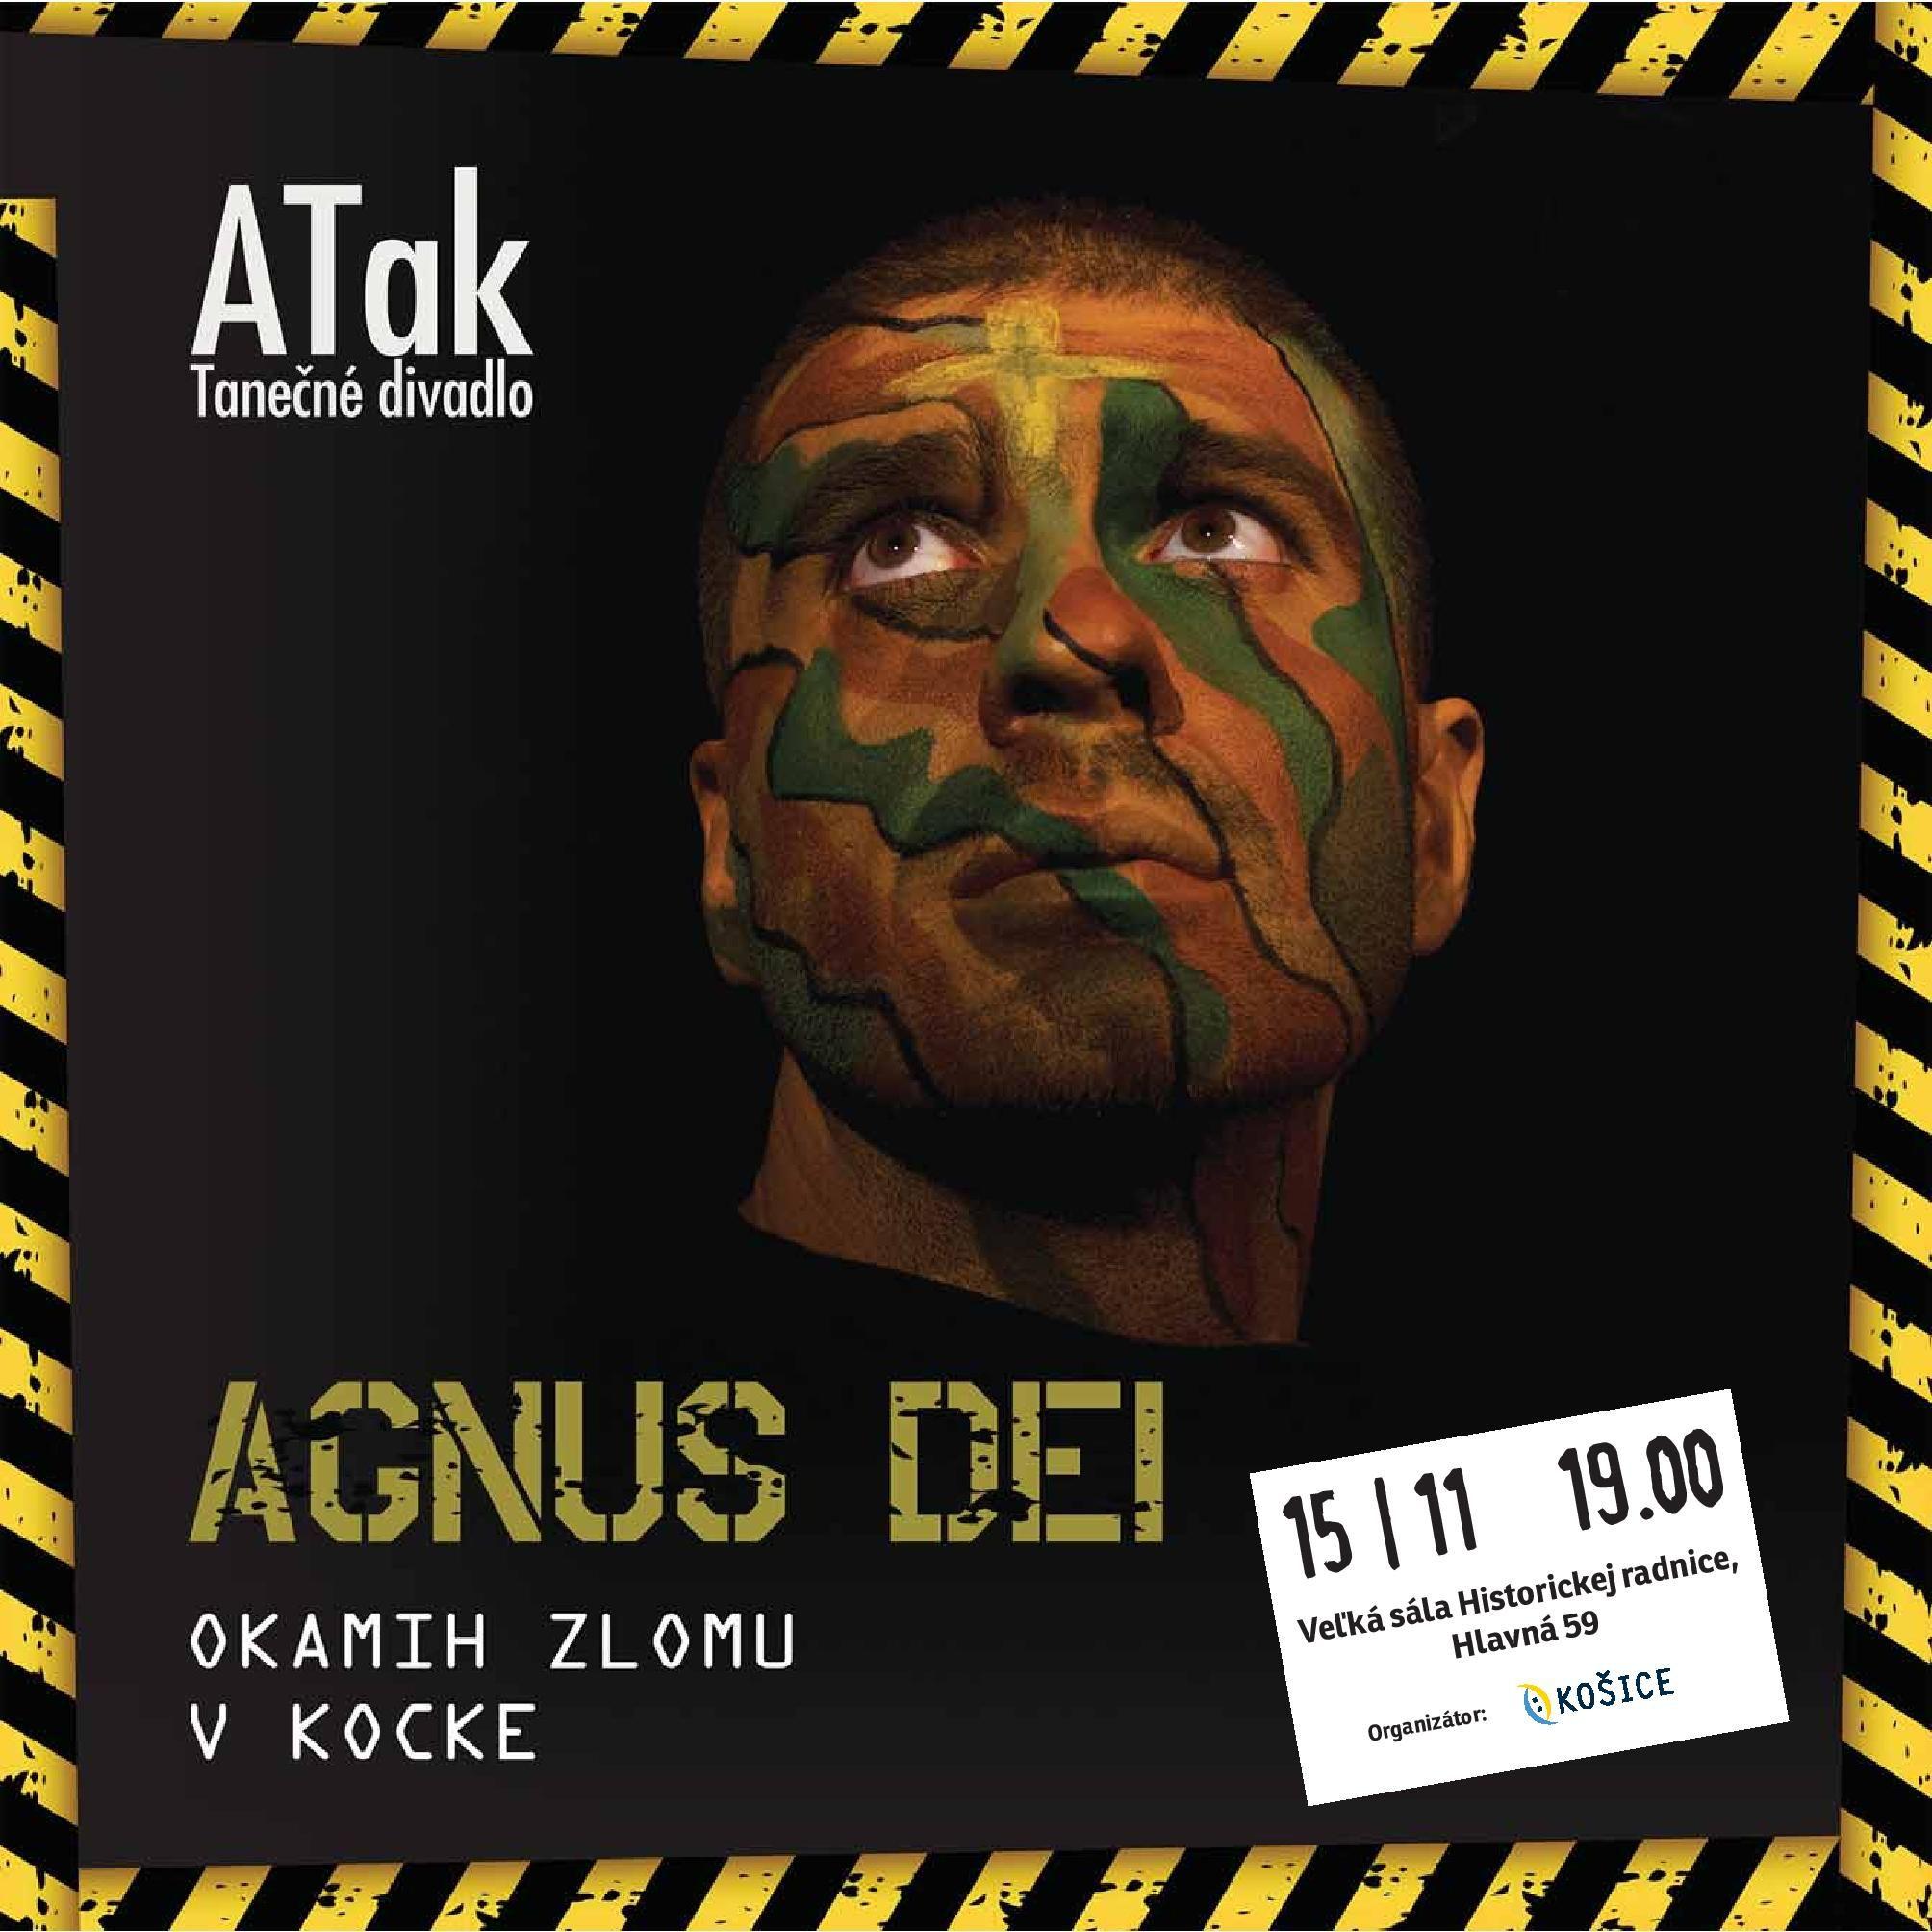 15.11.2019 AGNUS DEI - ATaK Tanečné divadlo